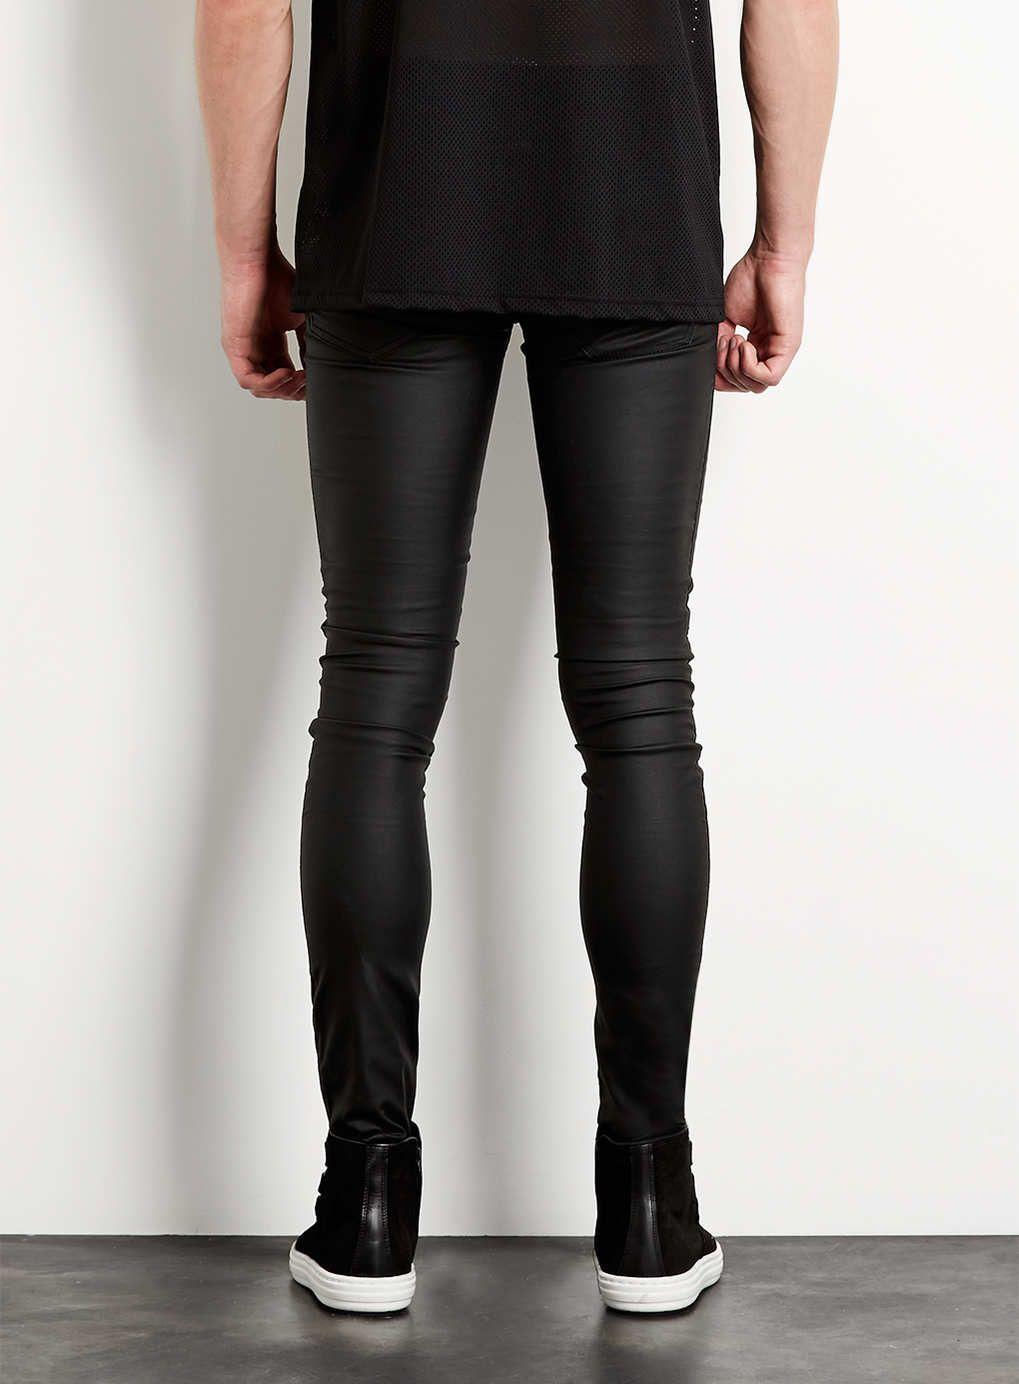 Black Leather Look Biker Spray On Skinny Jeans - TOPMAN USA   Men s ... 5fe6efda09